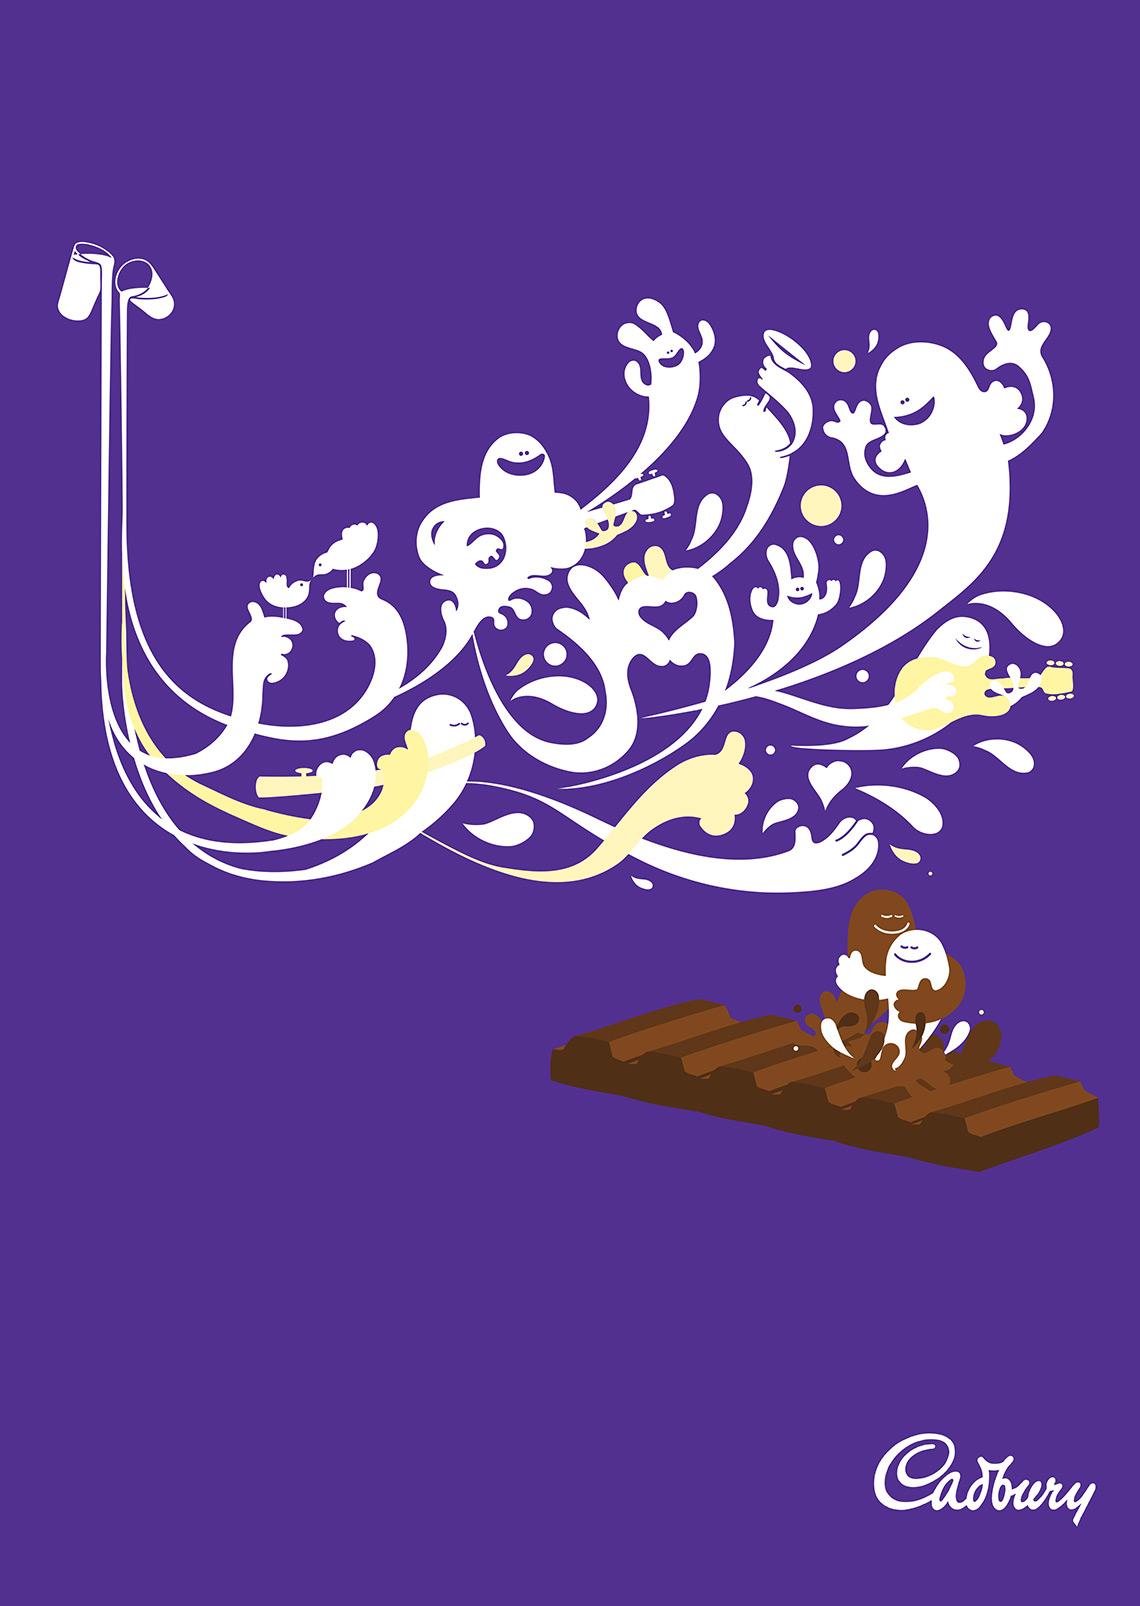 al_murphy_Cadbury_MilkParty.jpg